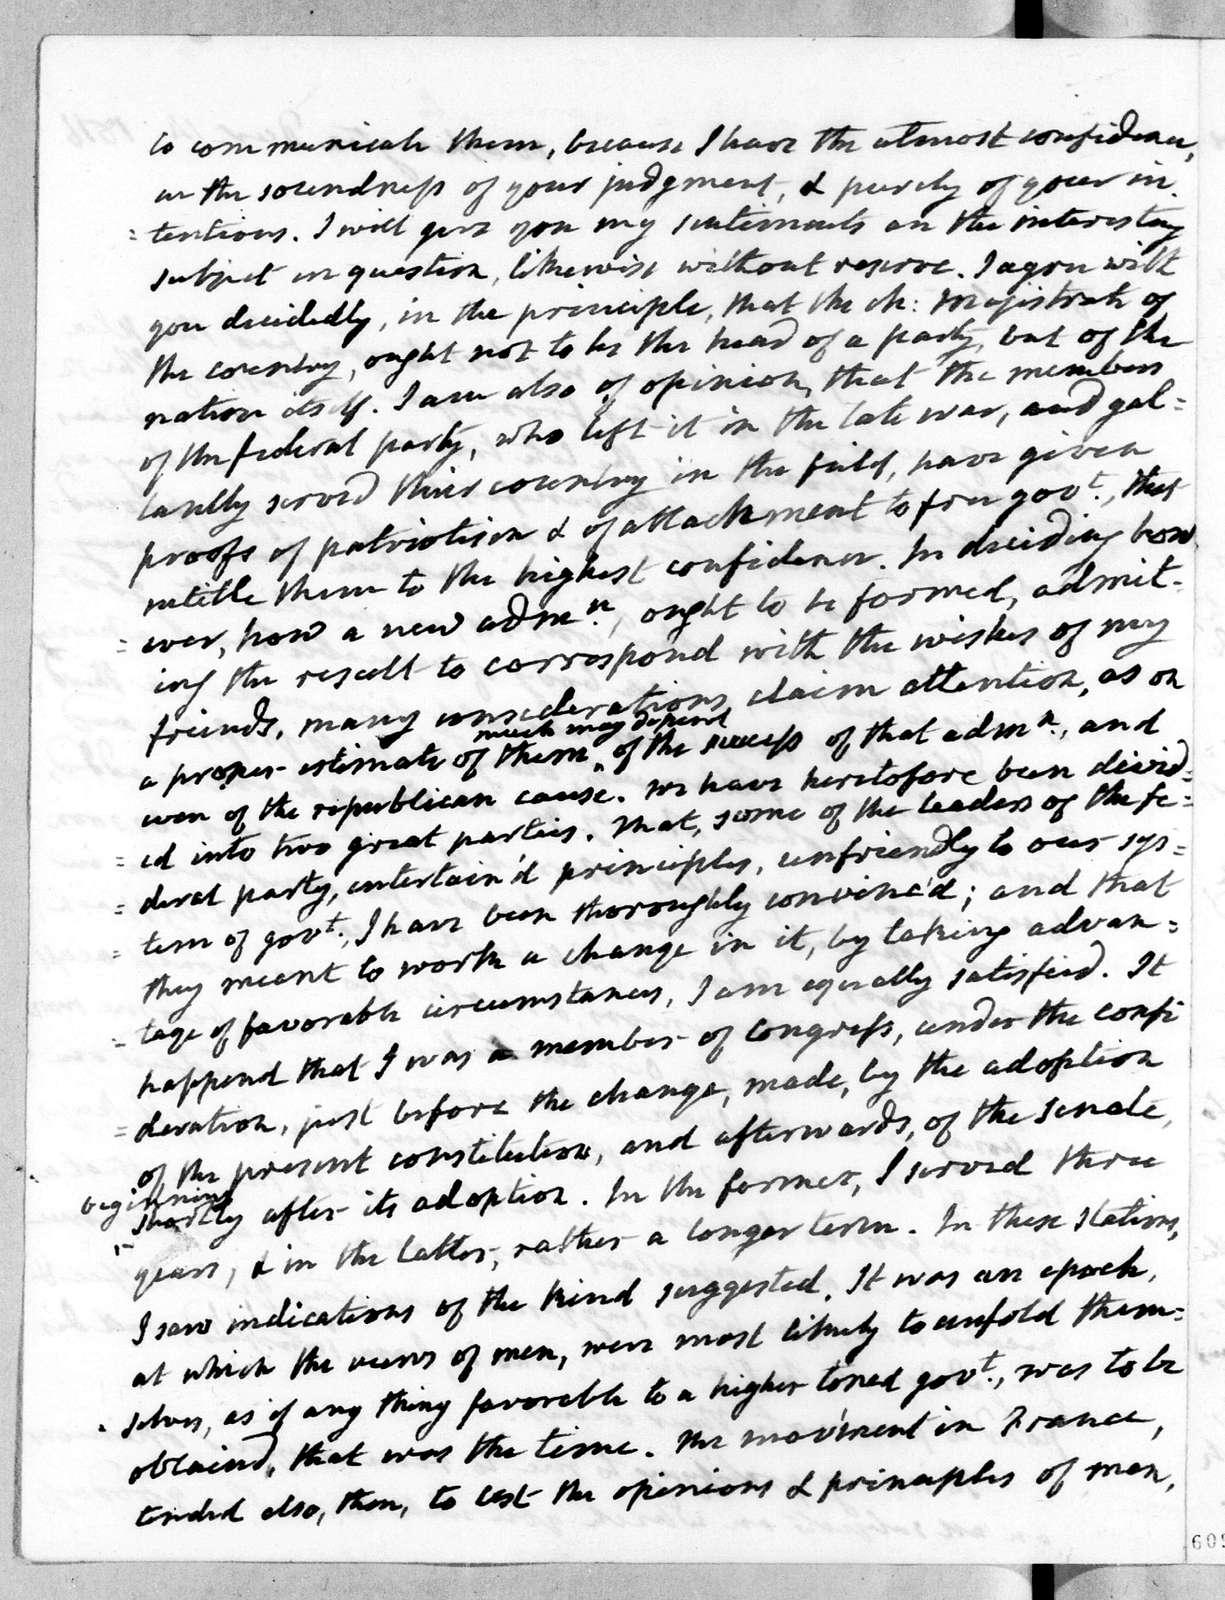 James Monroe to Andrew Jackson, December 14, 1816